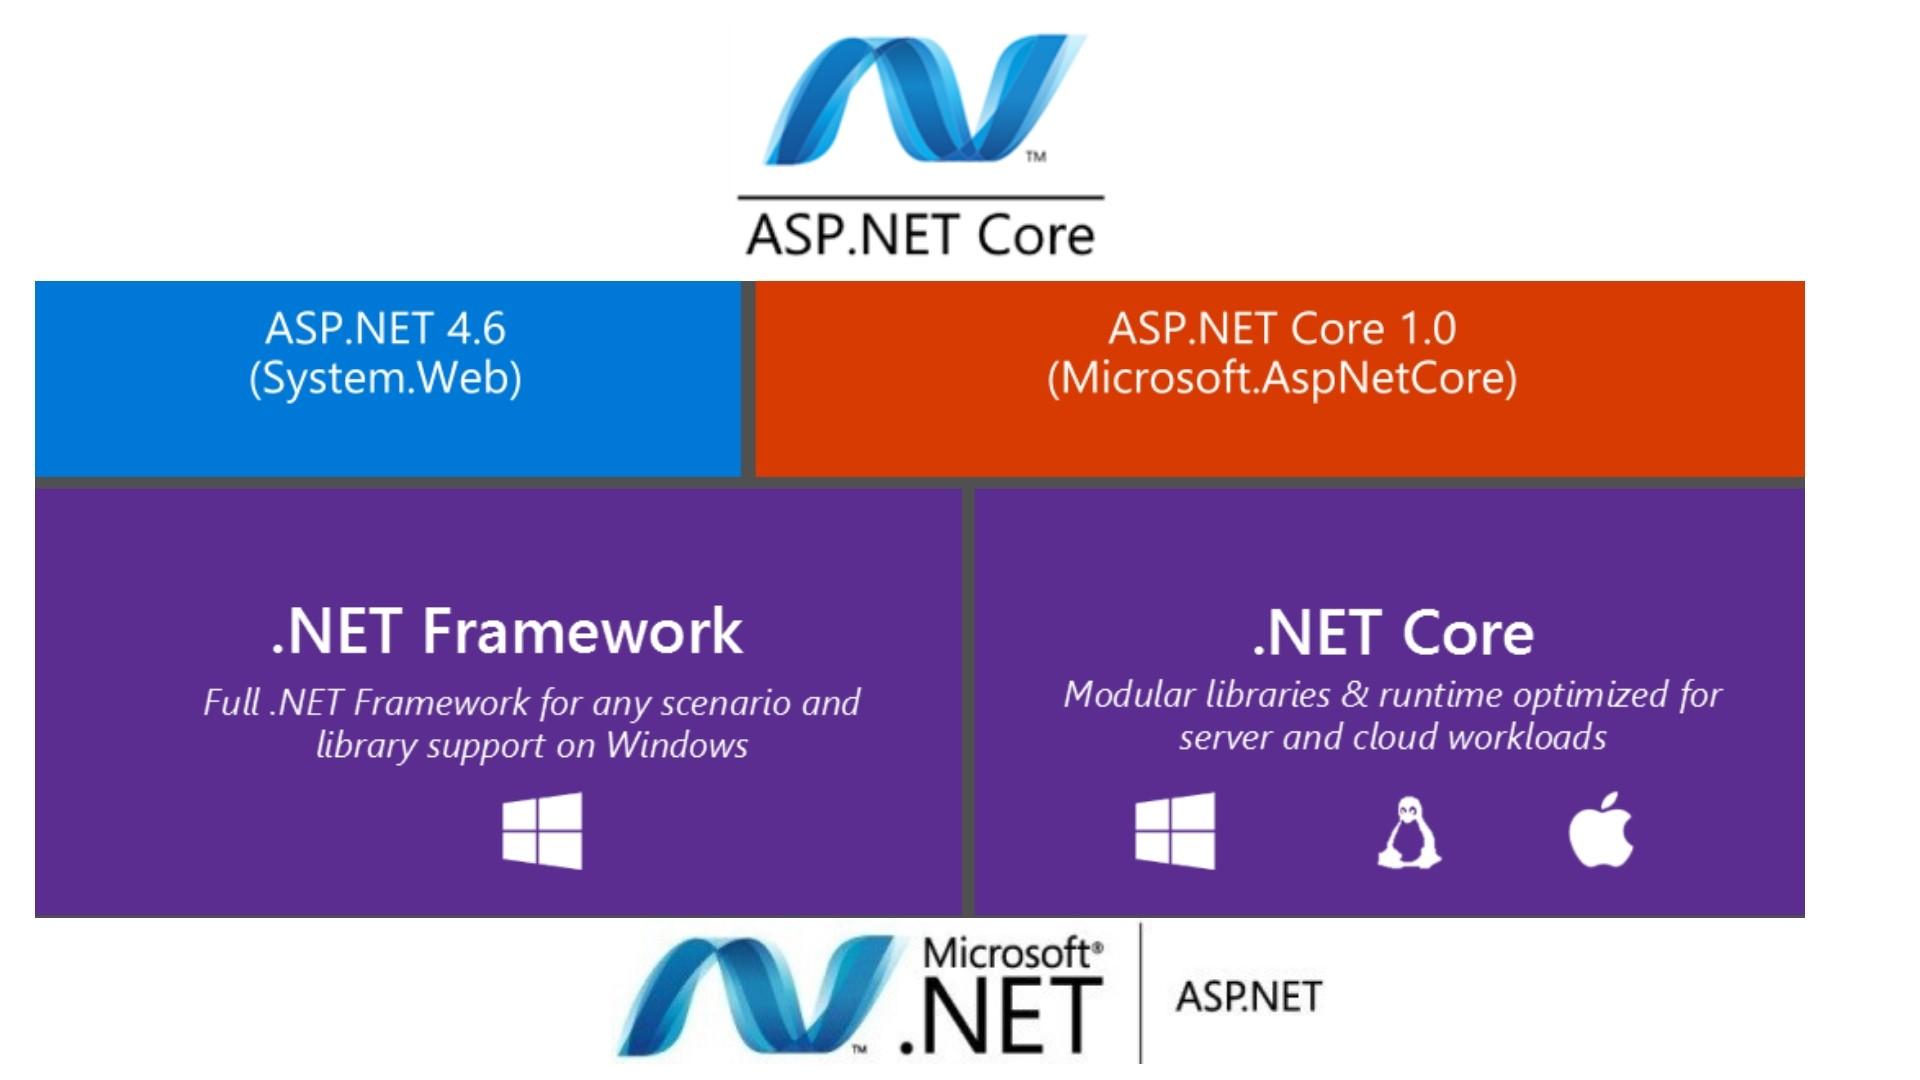 7 Reasons To Choose ASP.NET Core